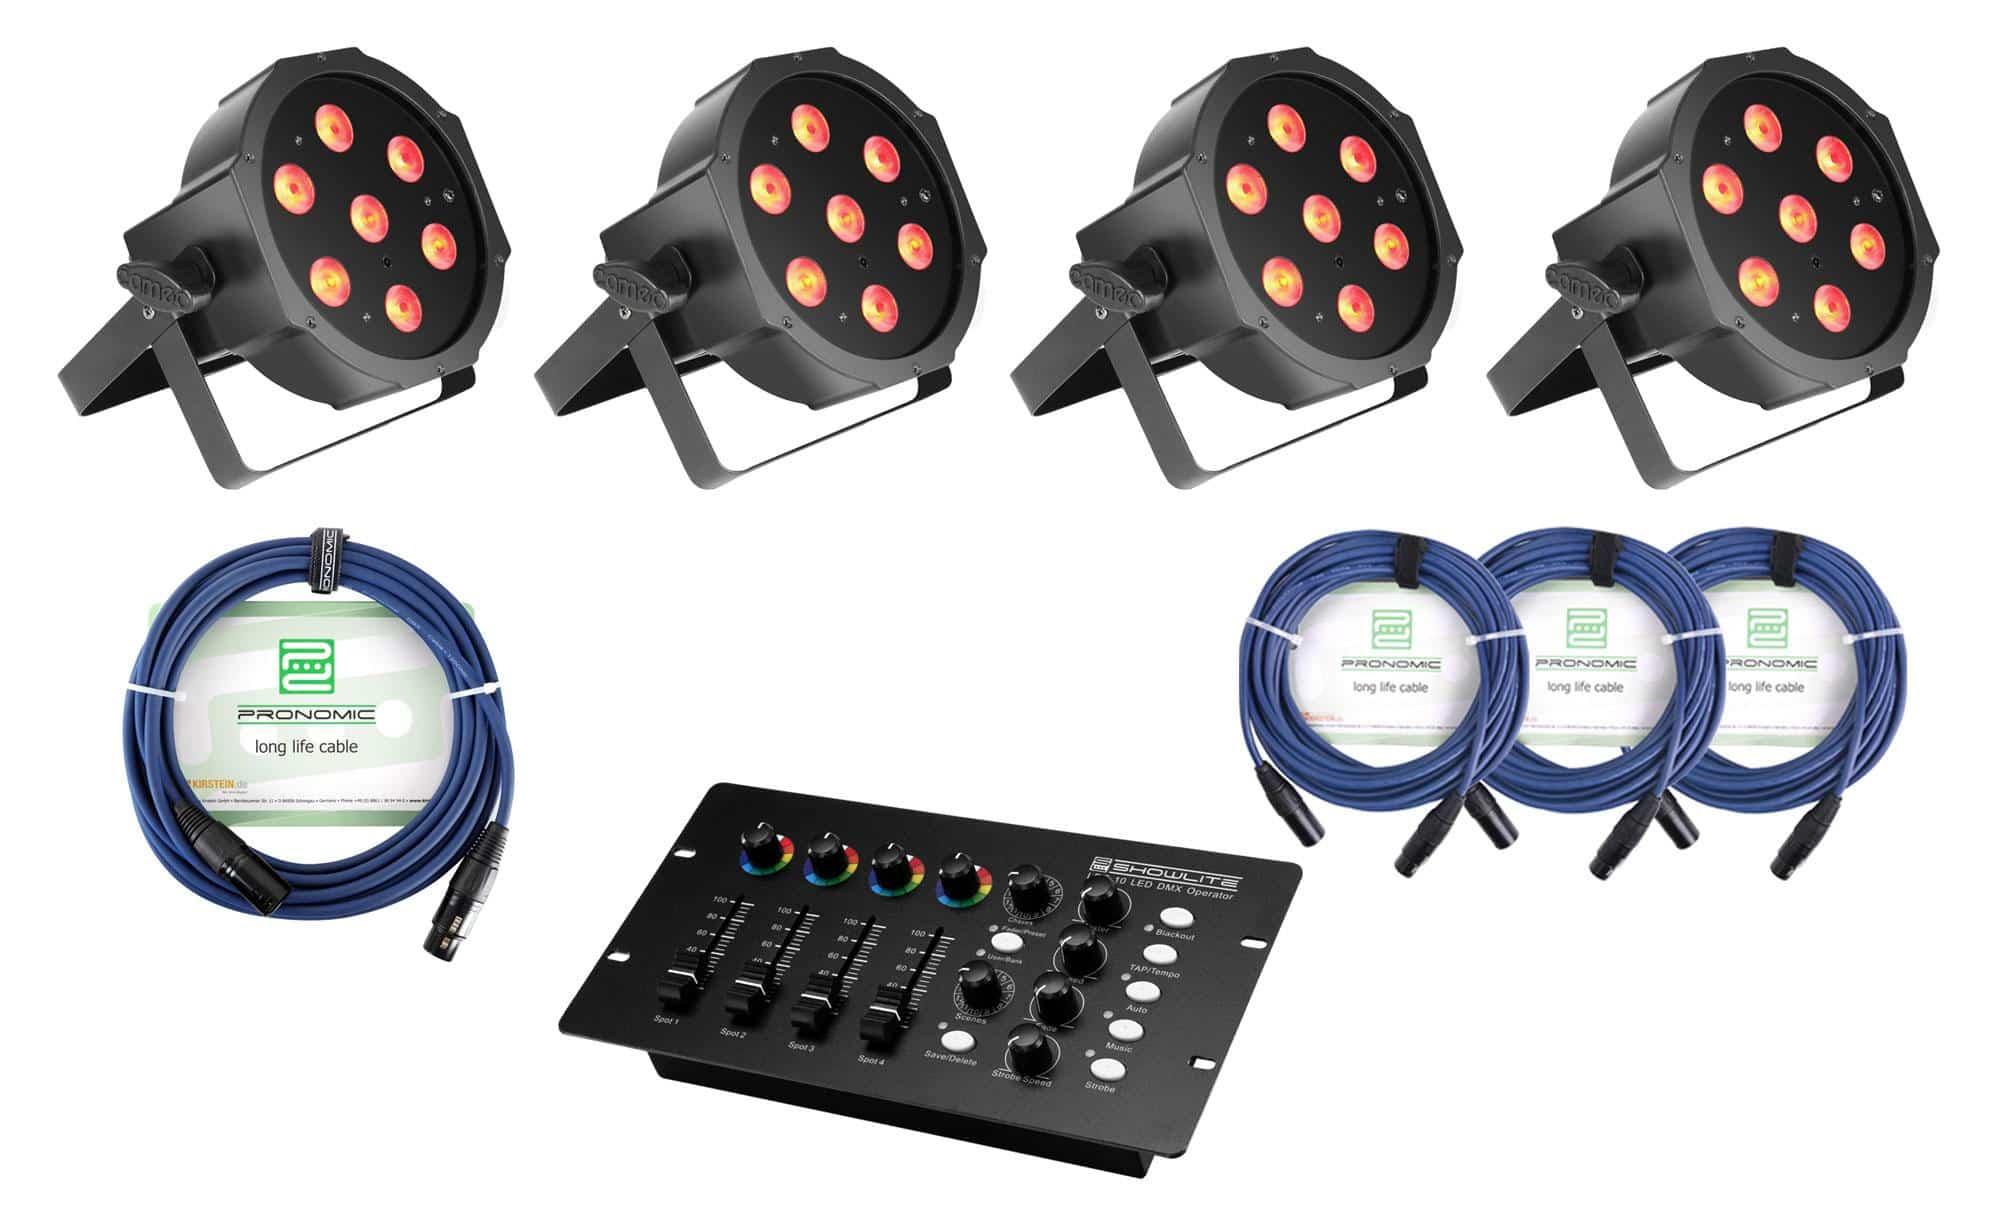 Lichtsets - Cameo Flat PAR 1 RGBW IR 4er Set inkl. DMX Controller Kabel - Onlineshop Musikhaus Kirstein